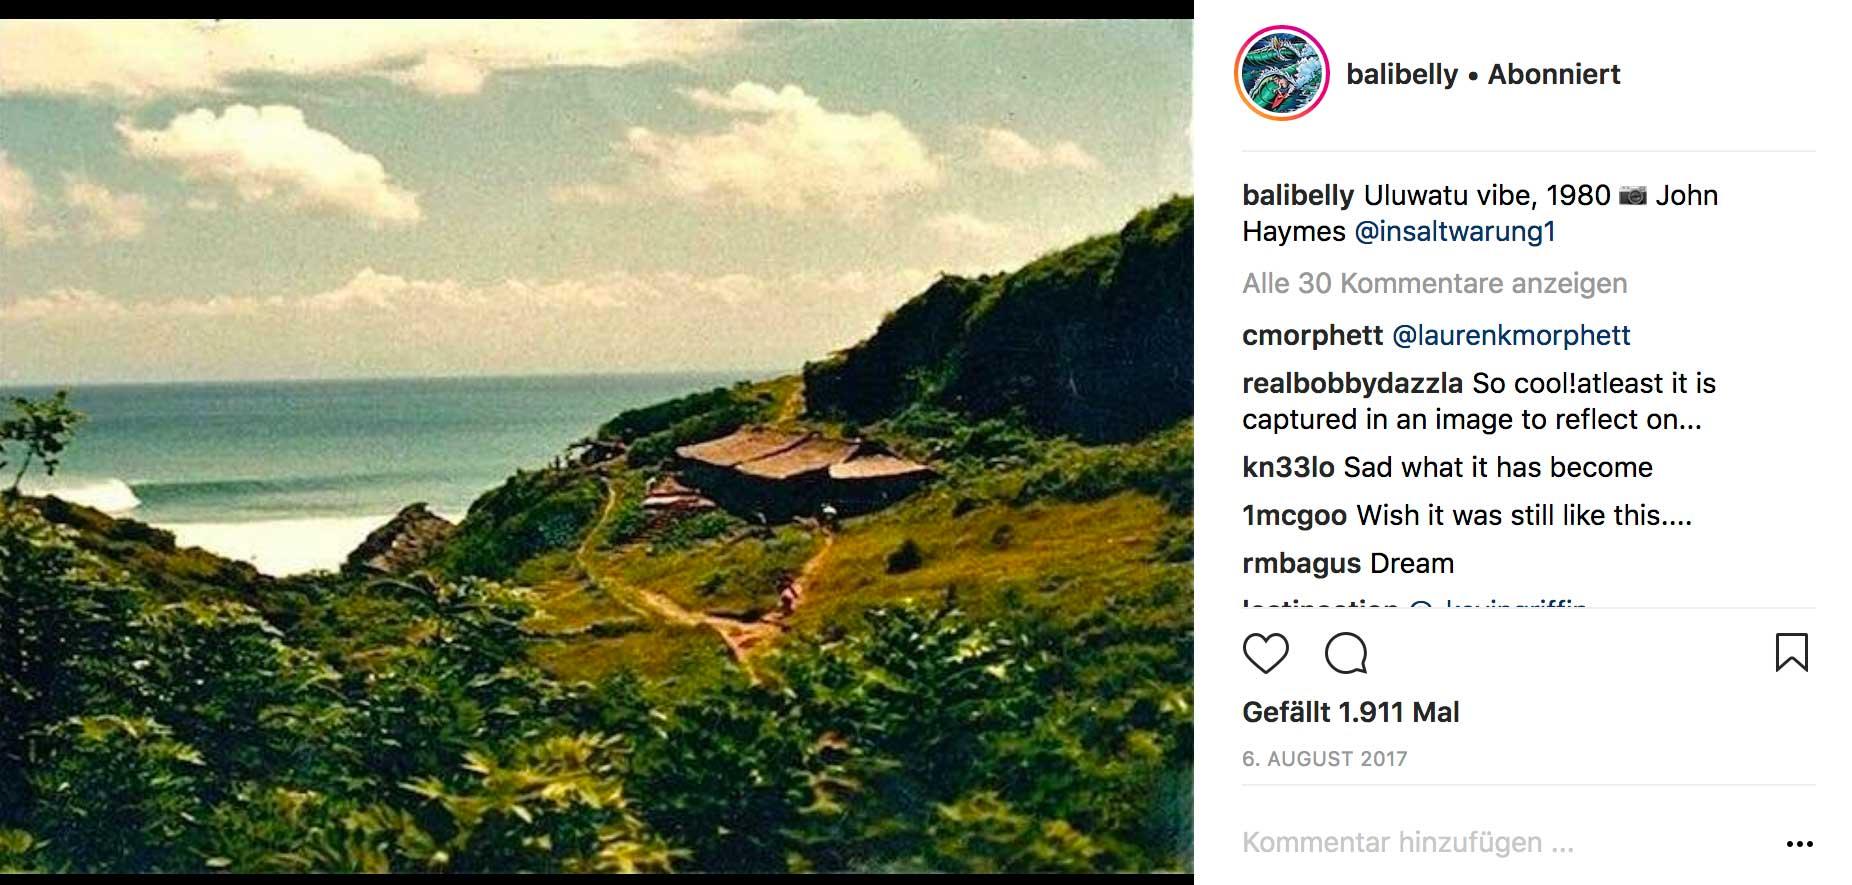 So sah der Fußpfad Richtung Uluwatu noch 1980 aus.